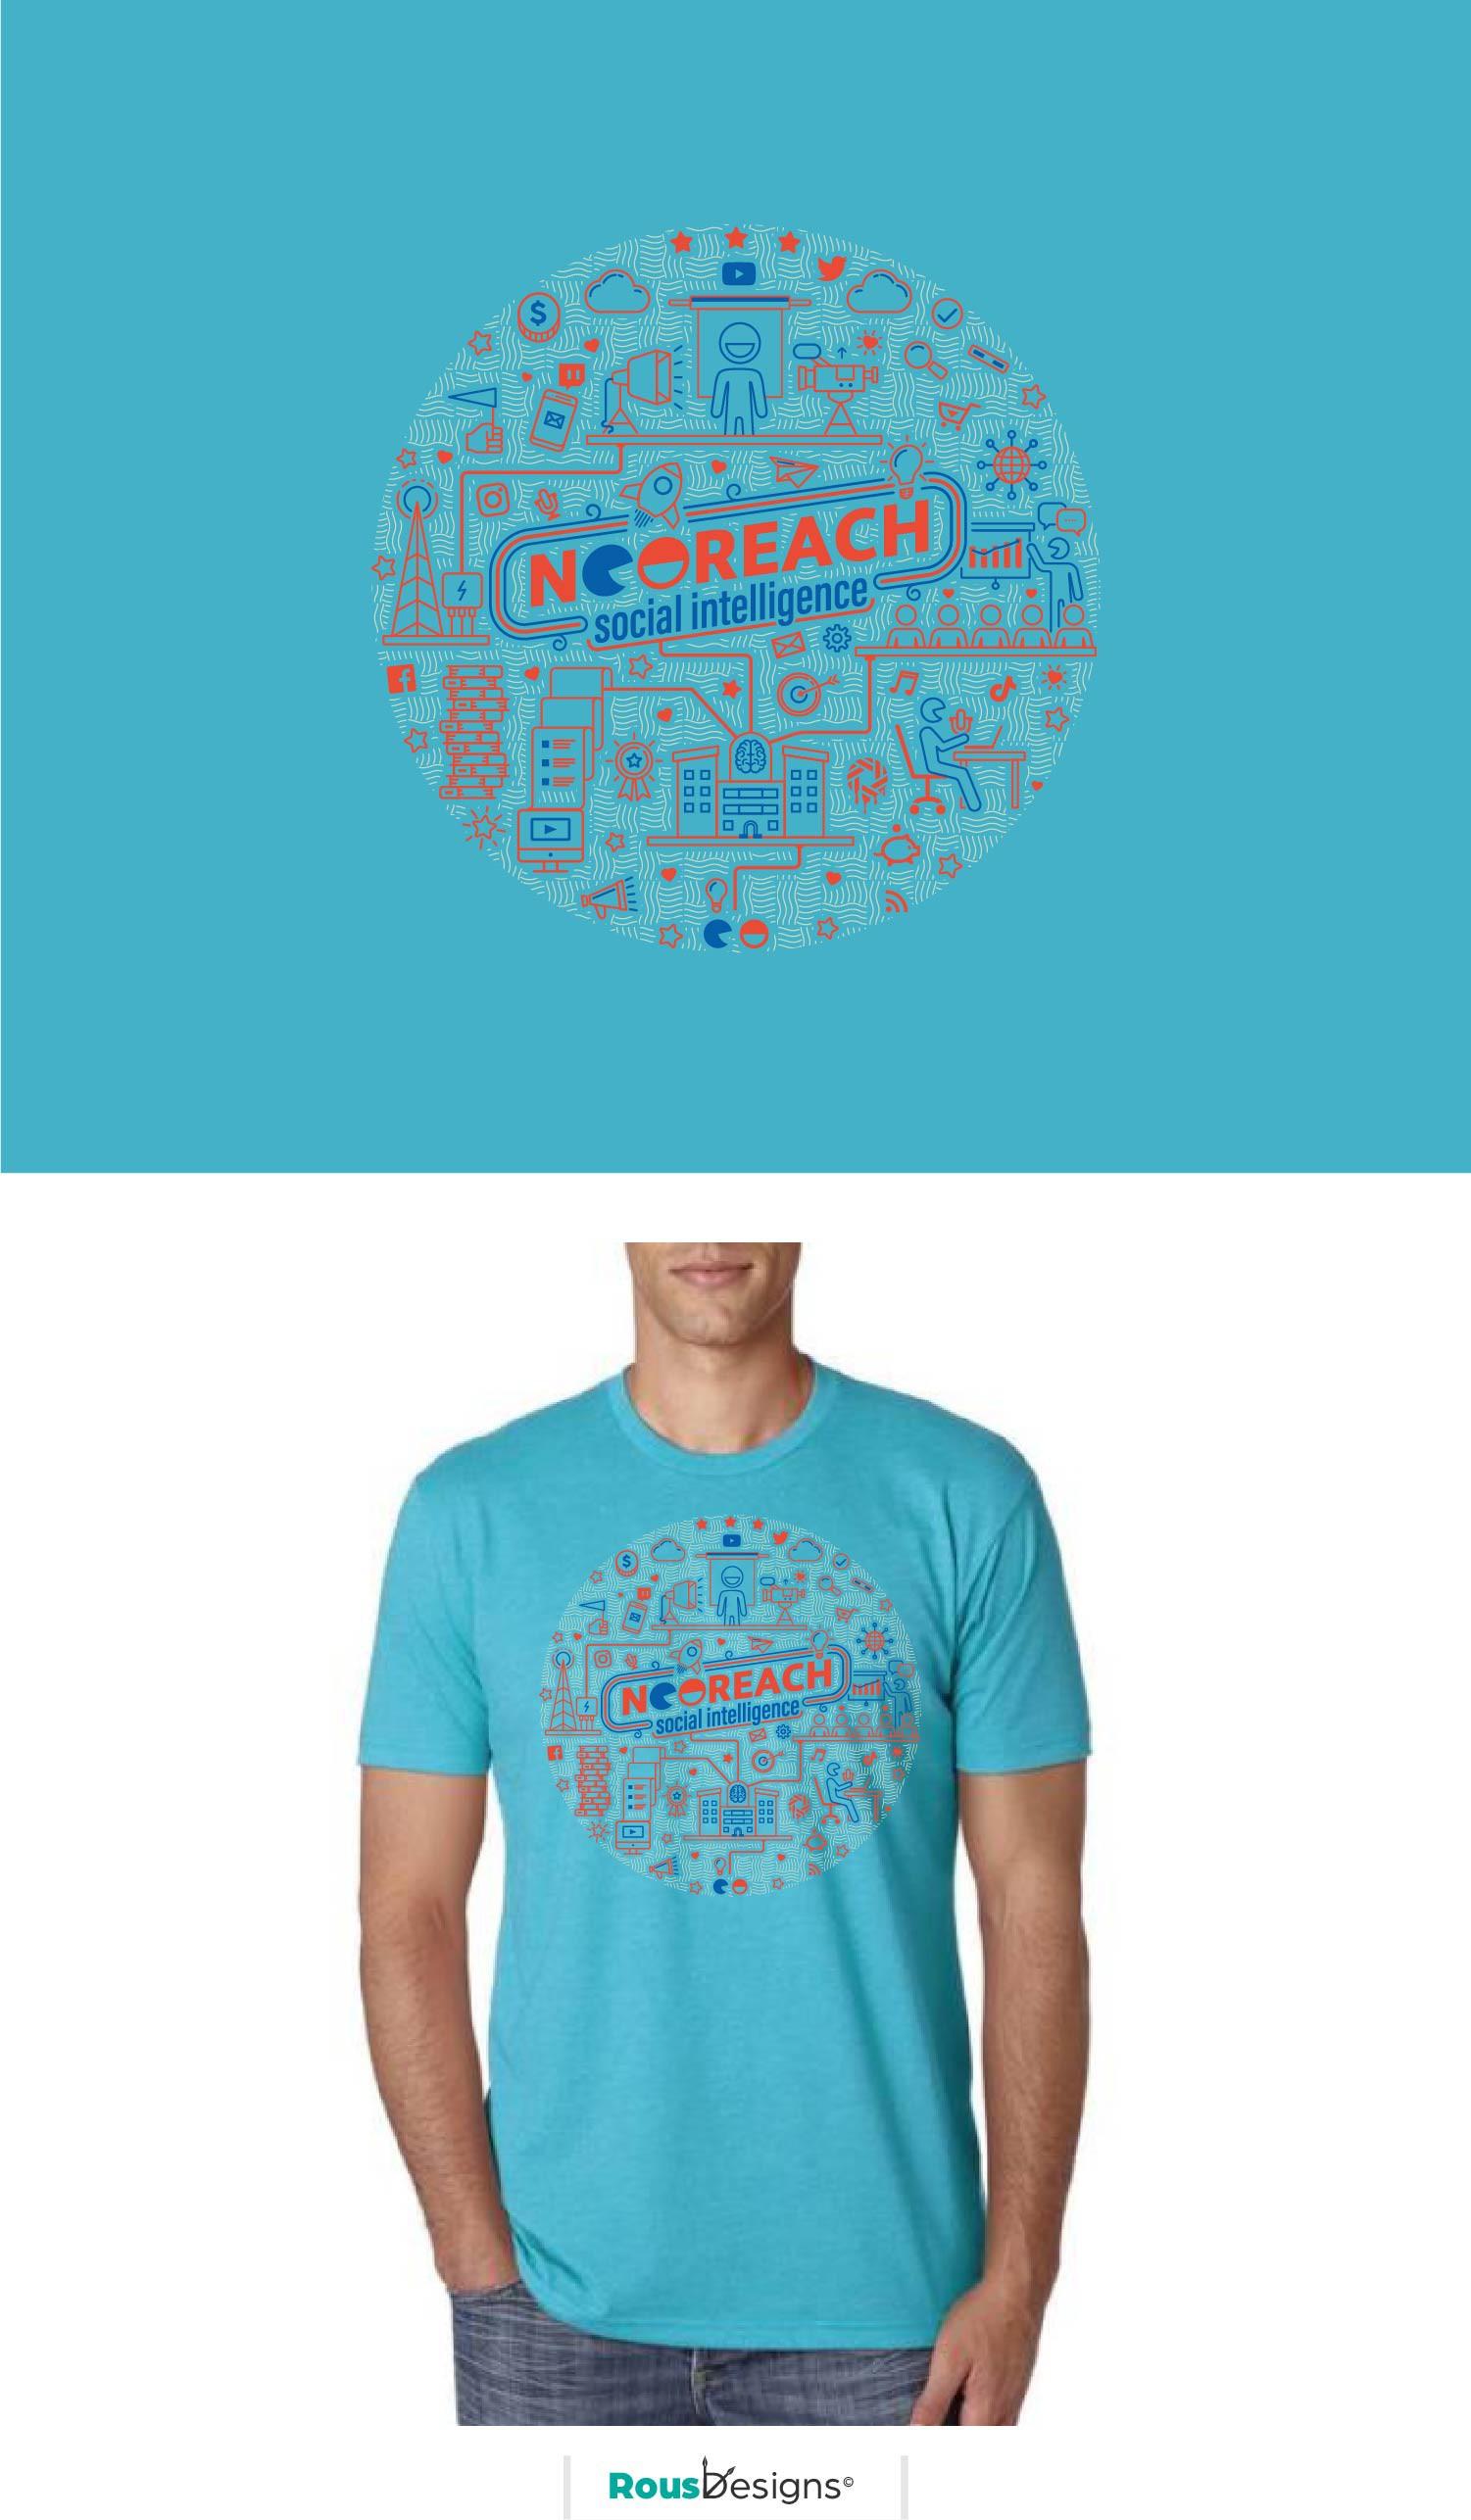 *GUARANTEED* Marketing Company Needs Fun Shirts!